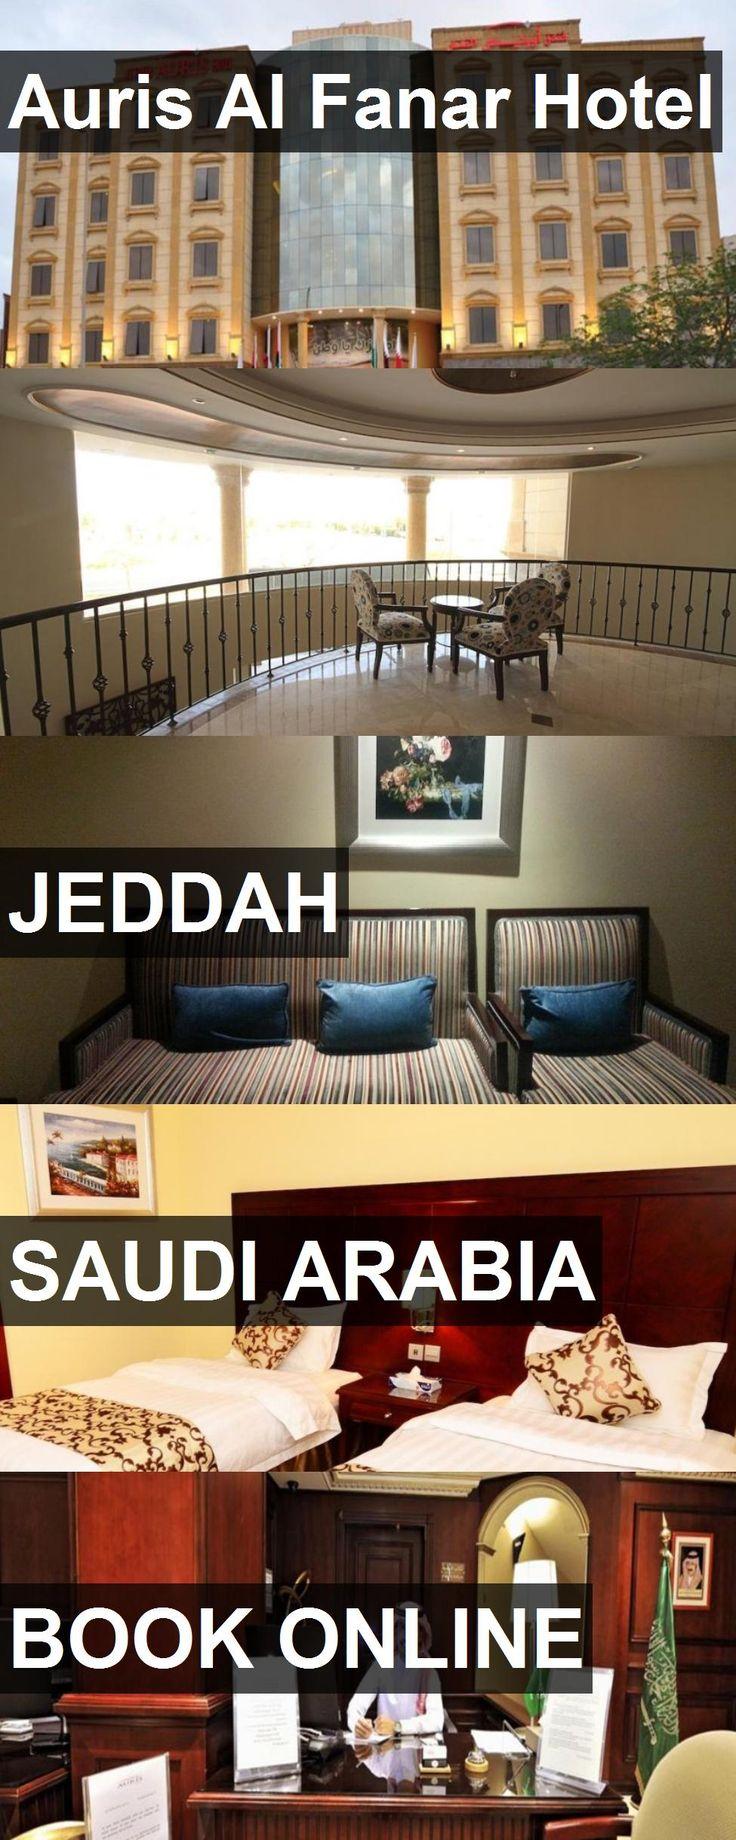 Auris Al Fanar Hotel In Jeddah Saudi Arabia For More Information Photos